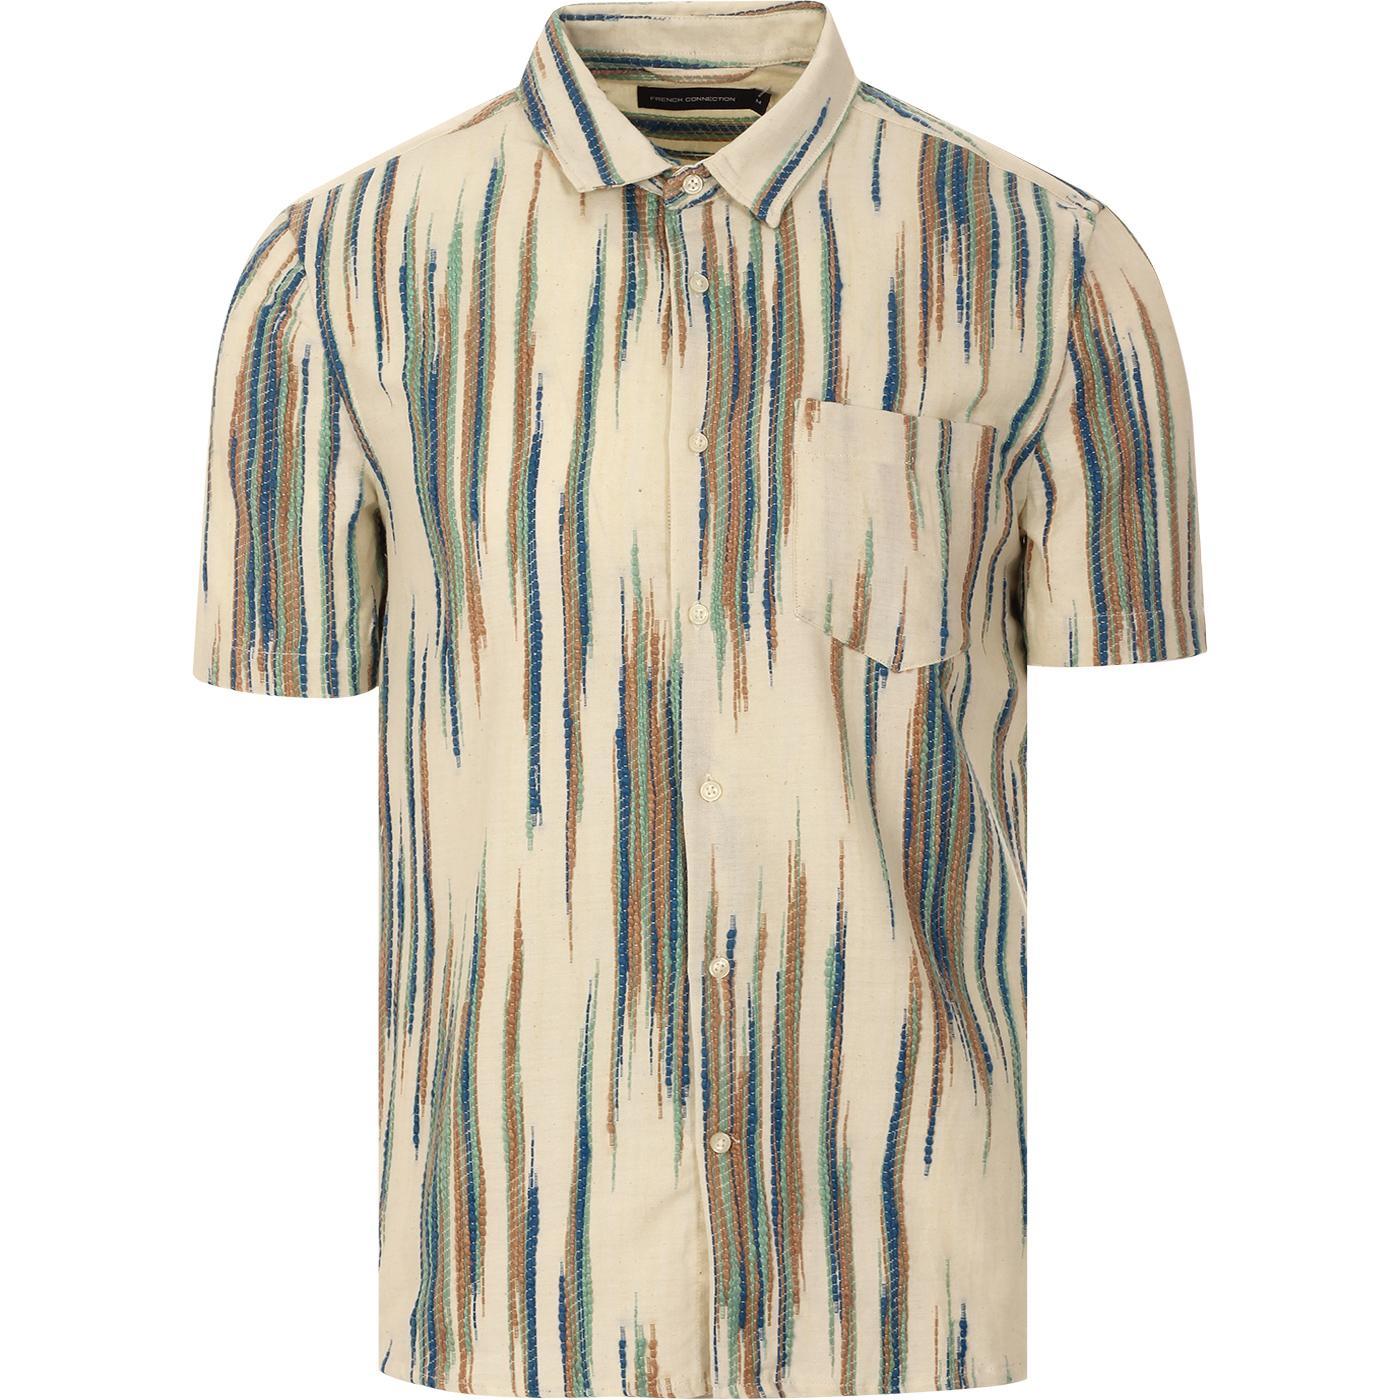 FRENCH CONNECTION Retro 70s Handloom Dobby Shirt